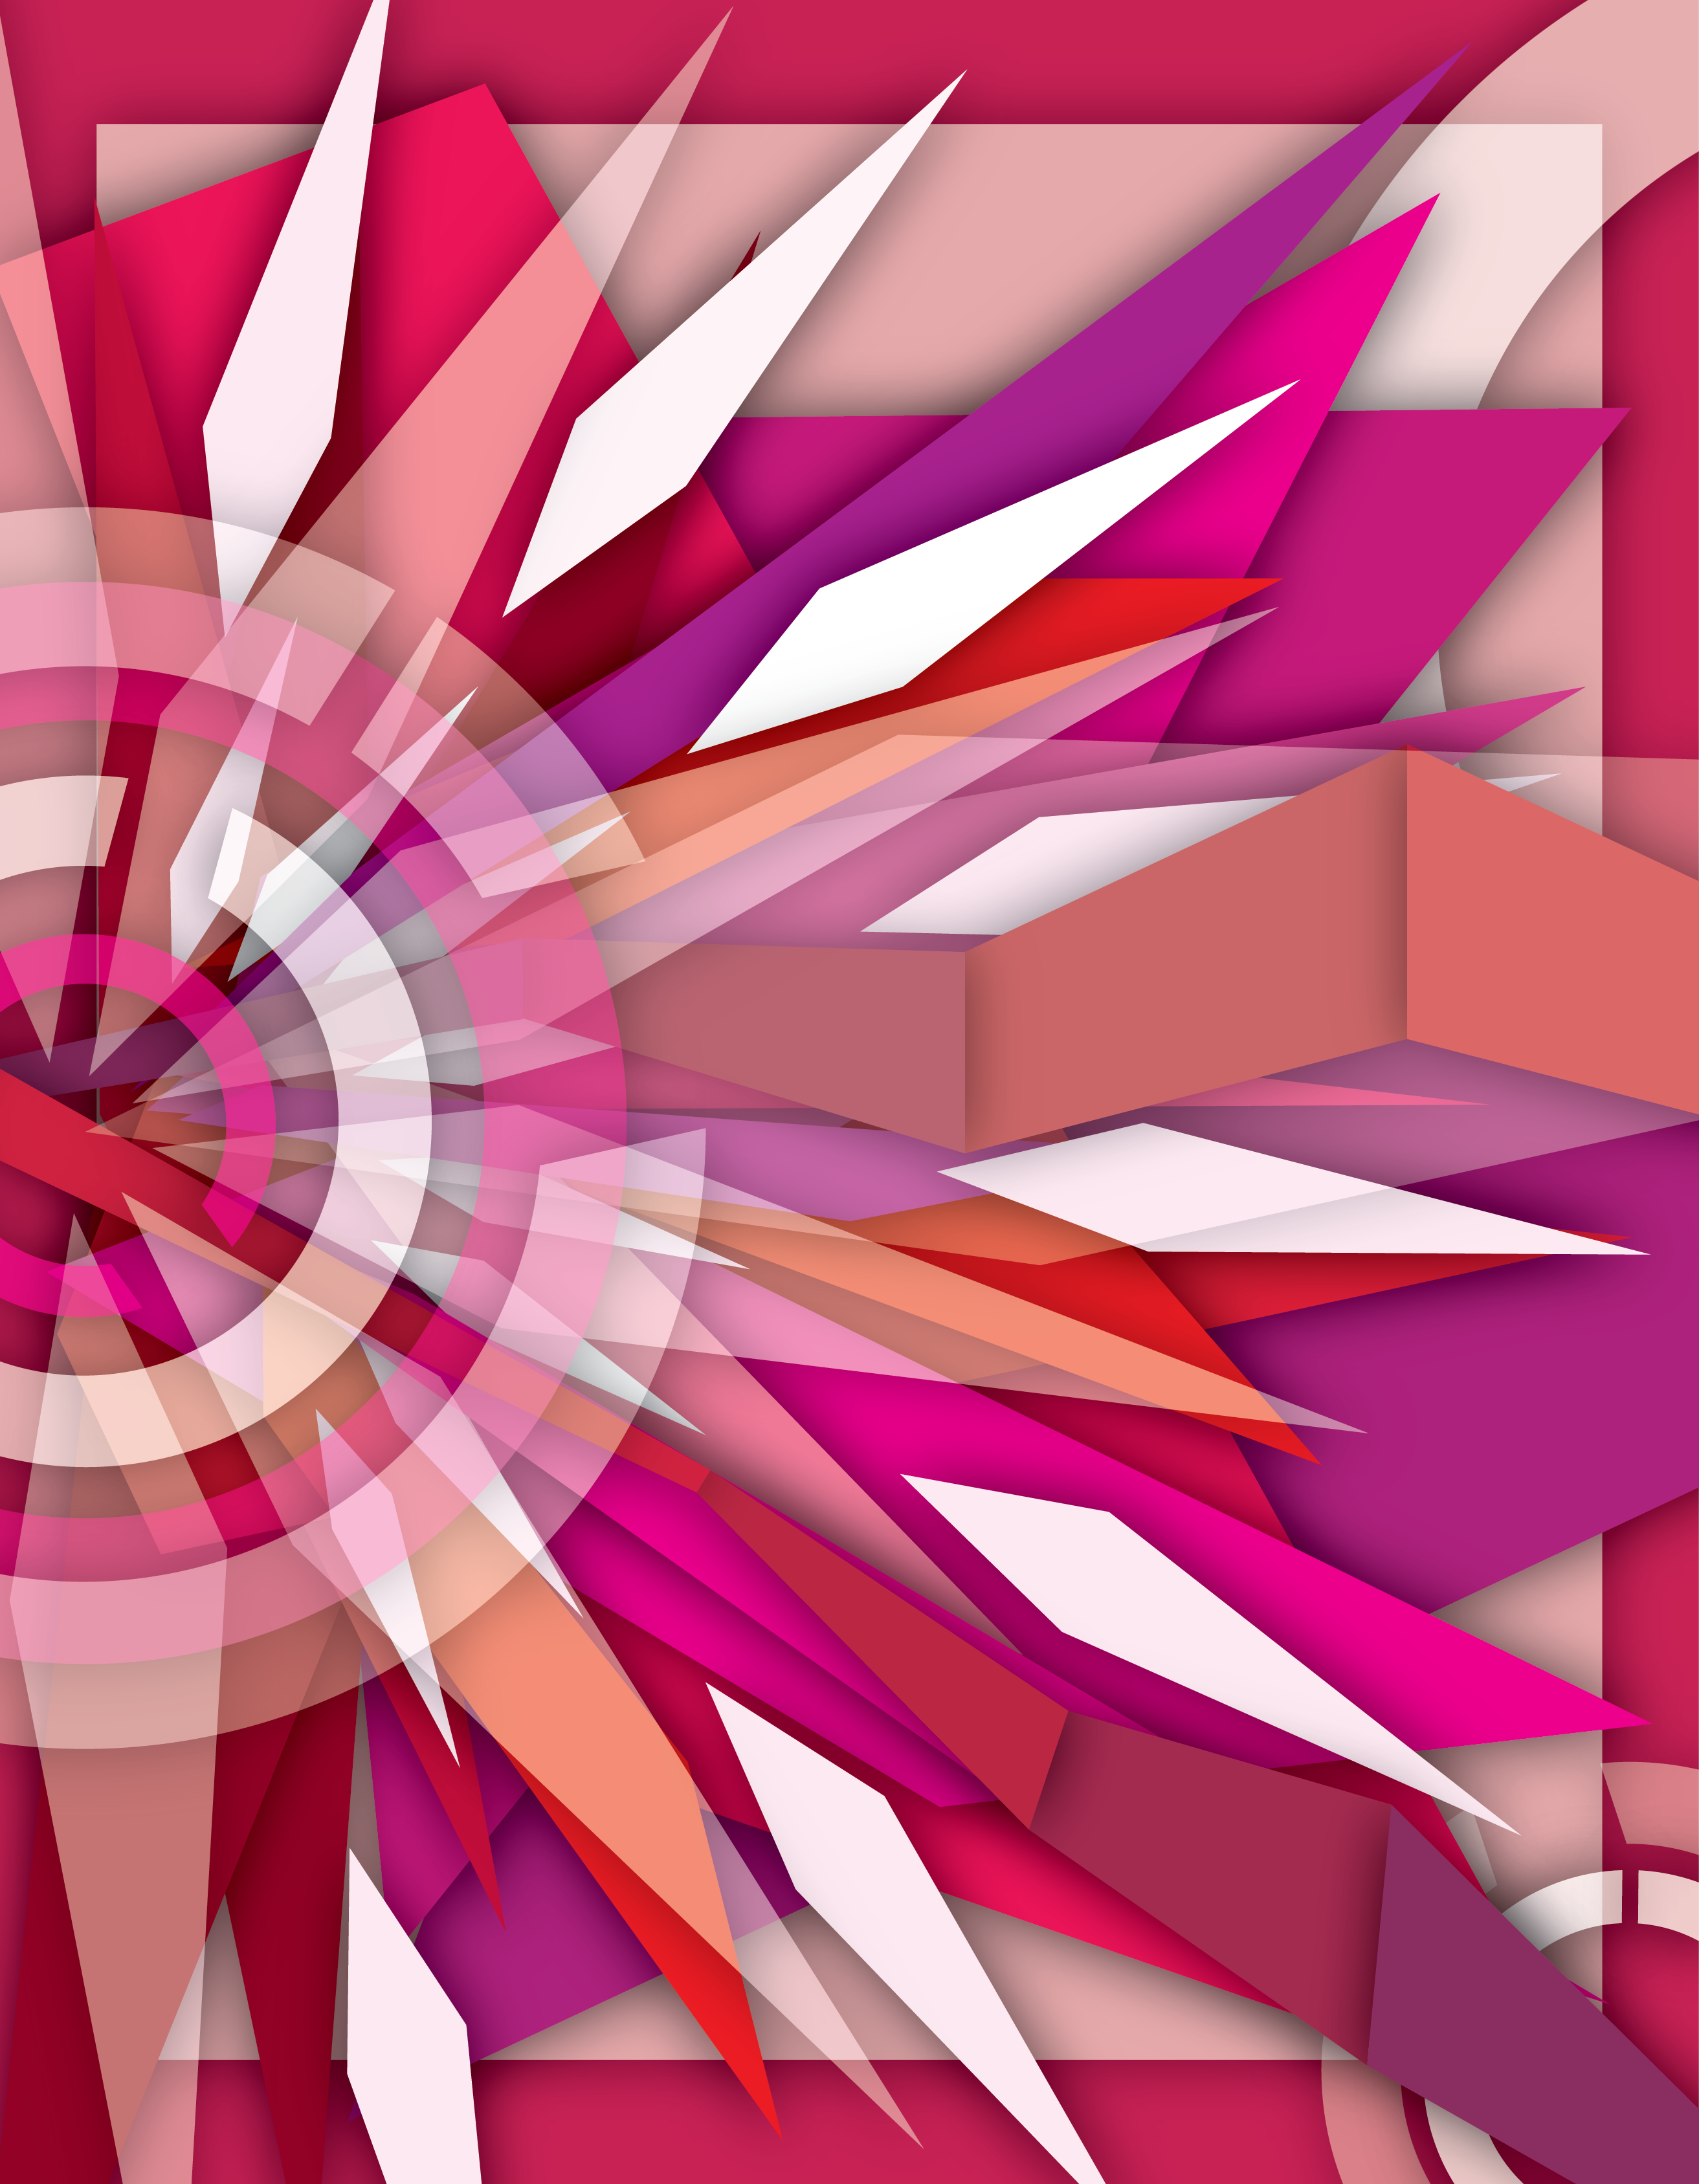 Bloom 1 by Kikaruu